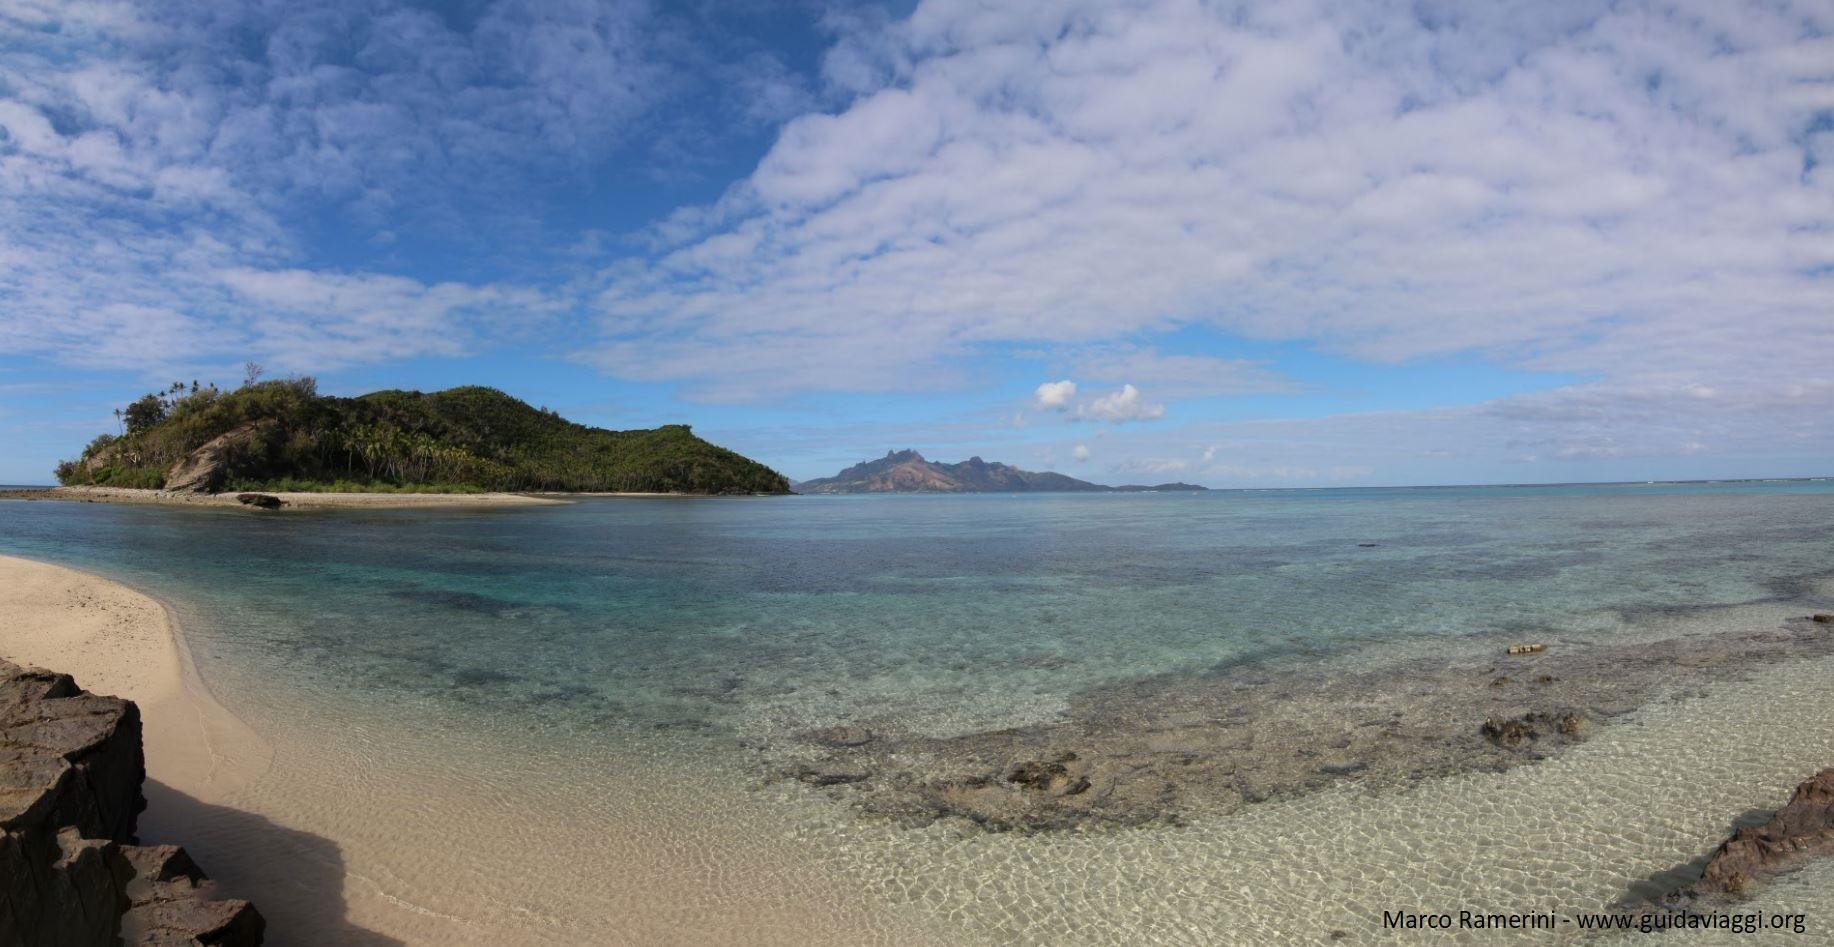 Vue d'ensemble de la lagune de Narara vue de Naukacuvu, îles Yasawa, Fidji. Auteur et Copyright Marco Ramerini